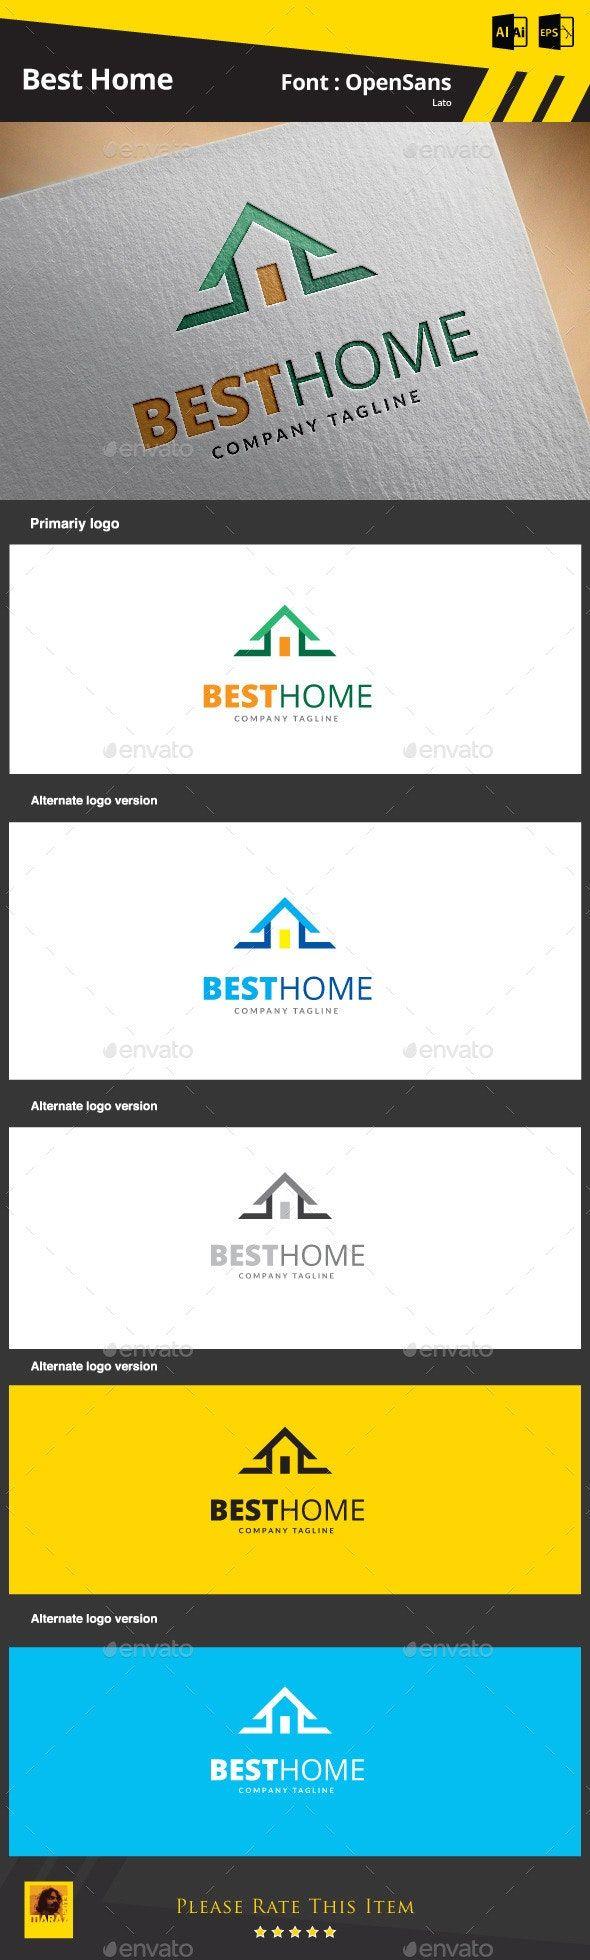 Best Home AD Home Home design software, Home logo